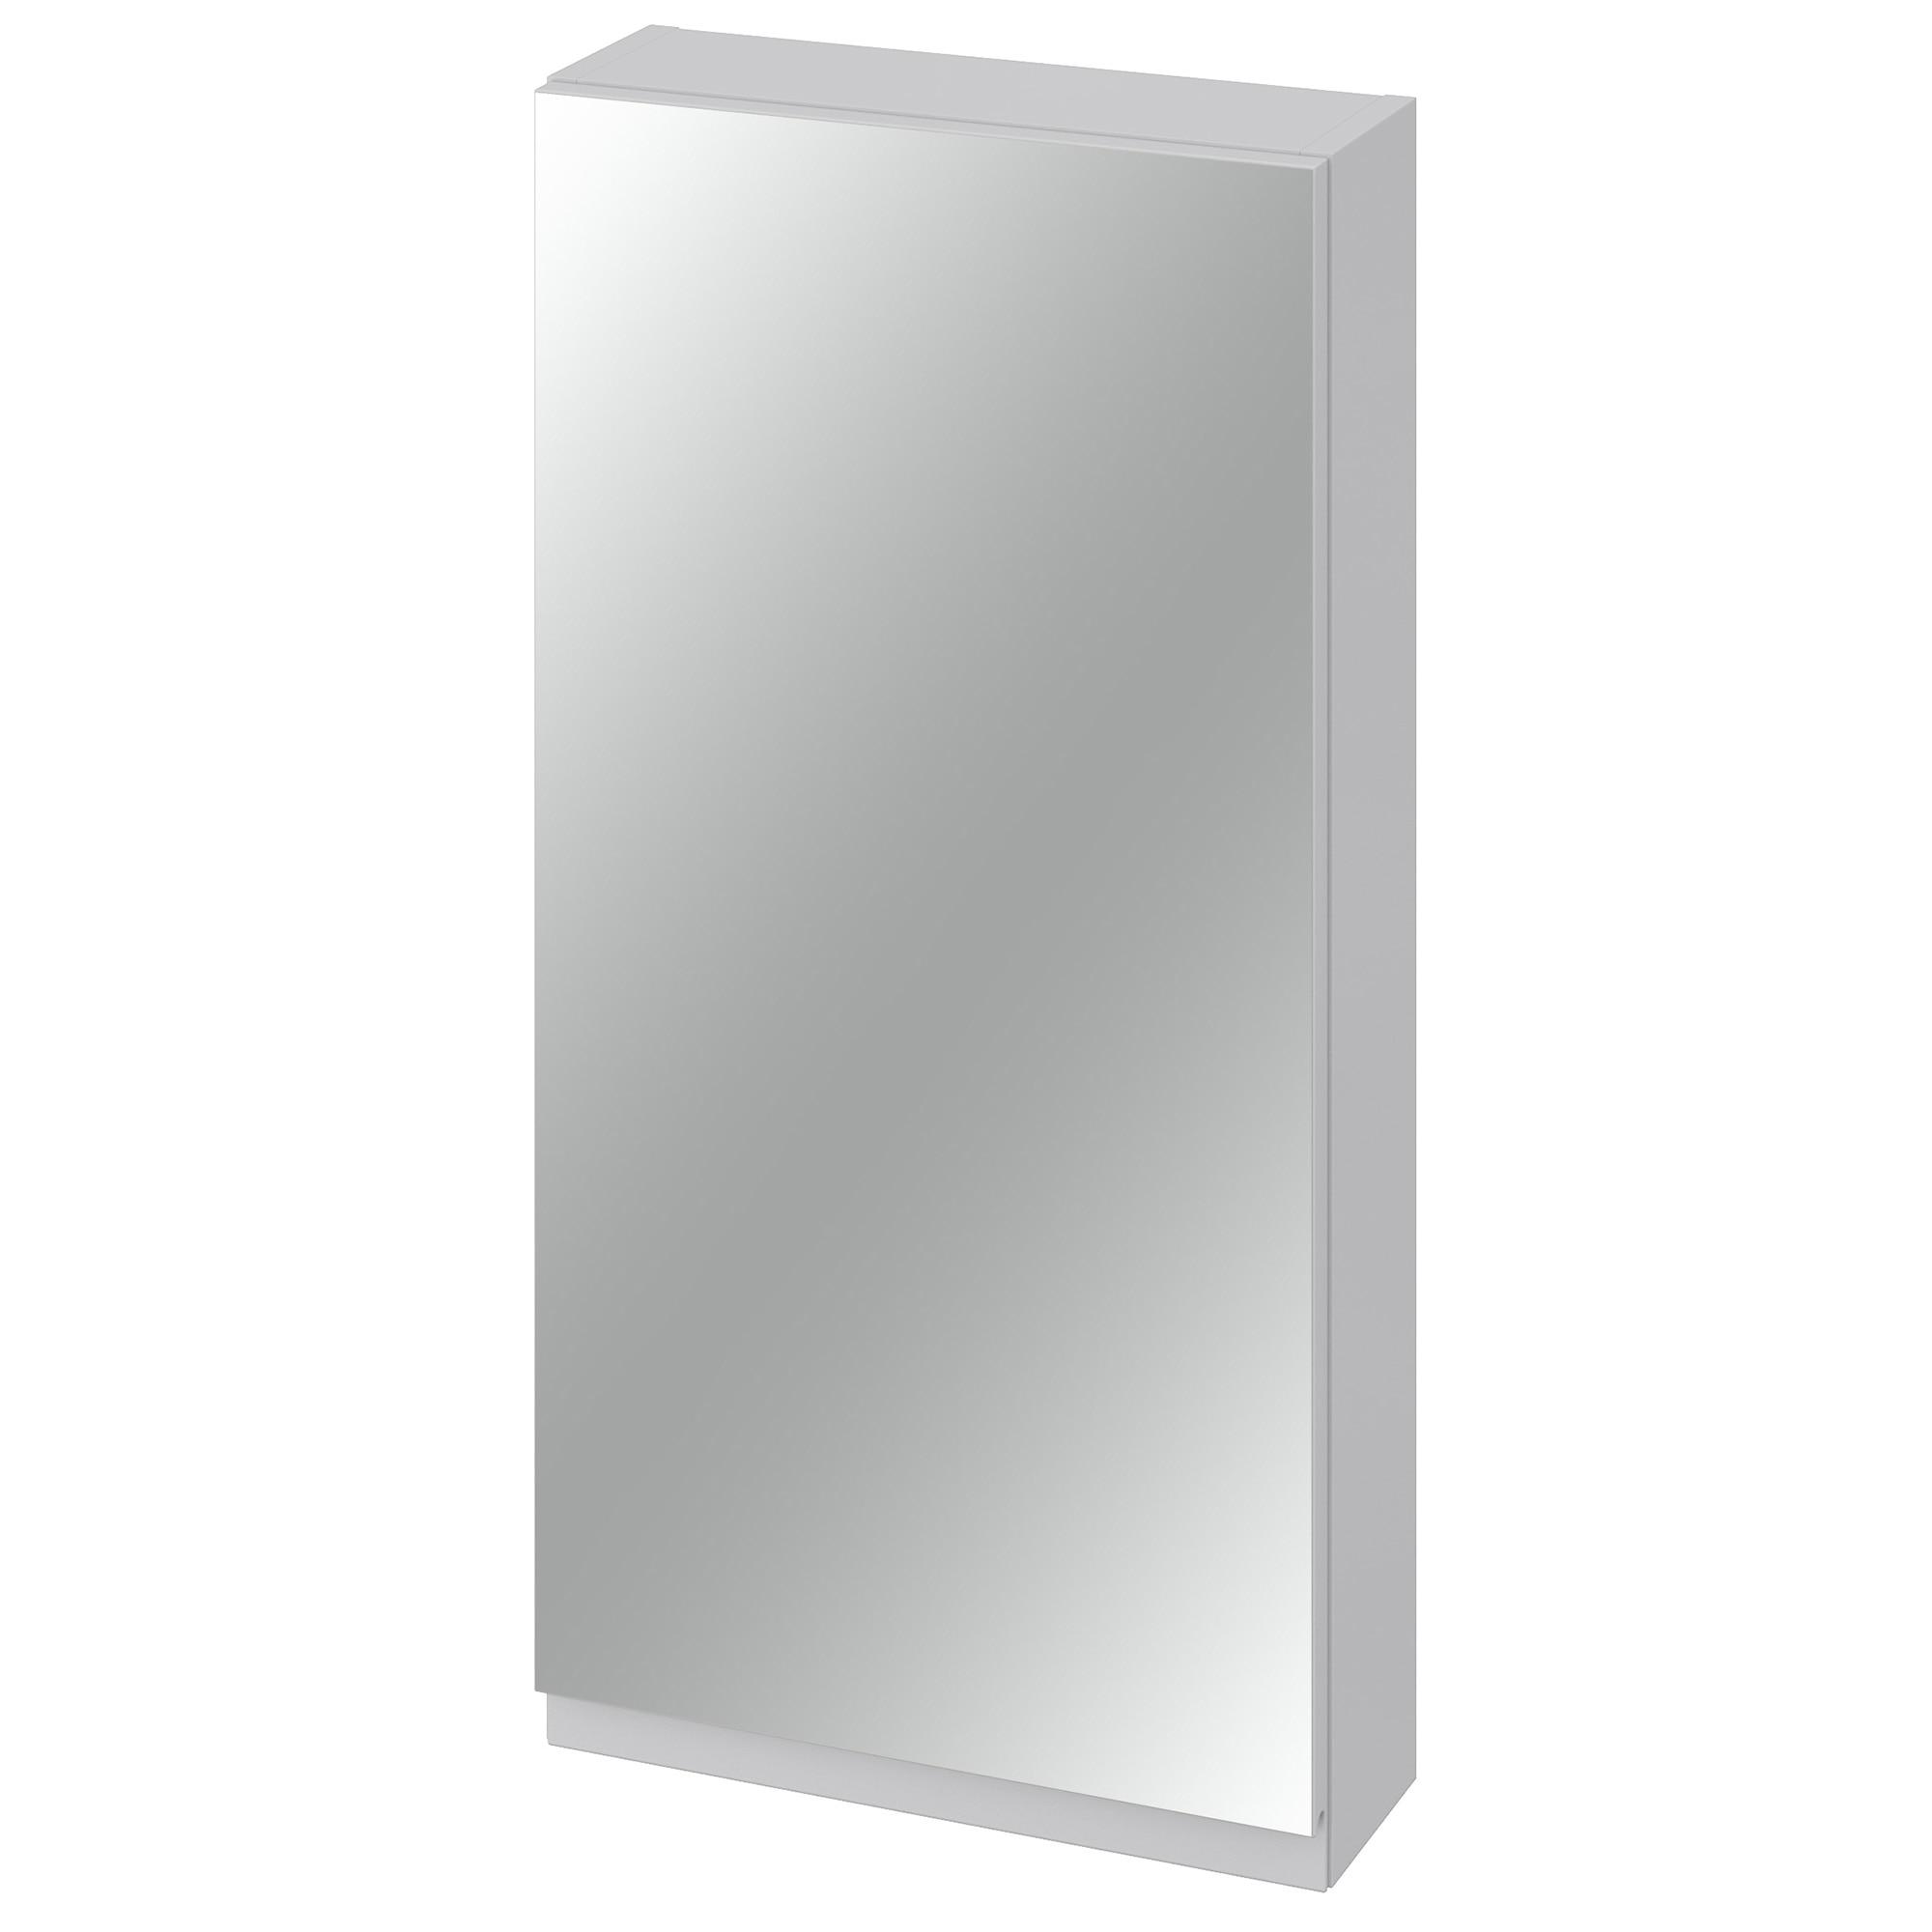 Fotografie Dulap cu oglinda Cersanit Moduo, S590-031, 3 rafturi, inchidere lenta, 80x40x14.1 cm, Gri